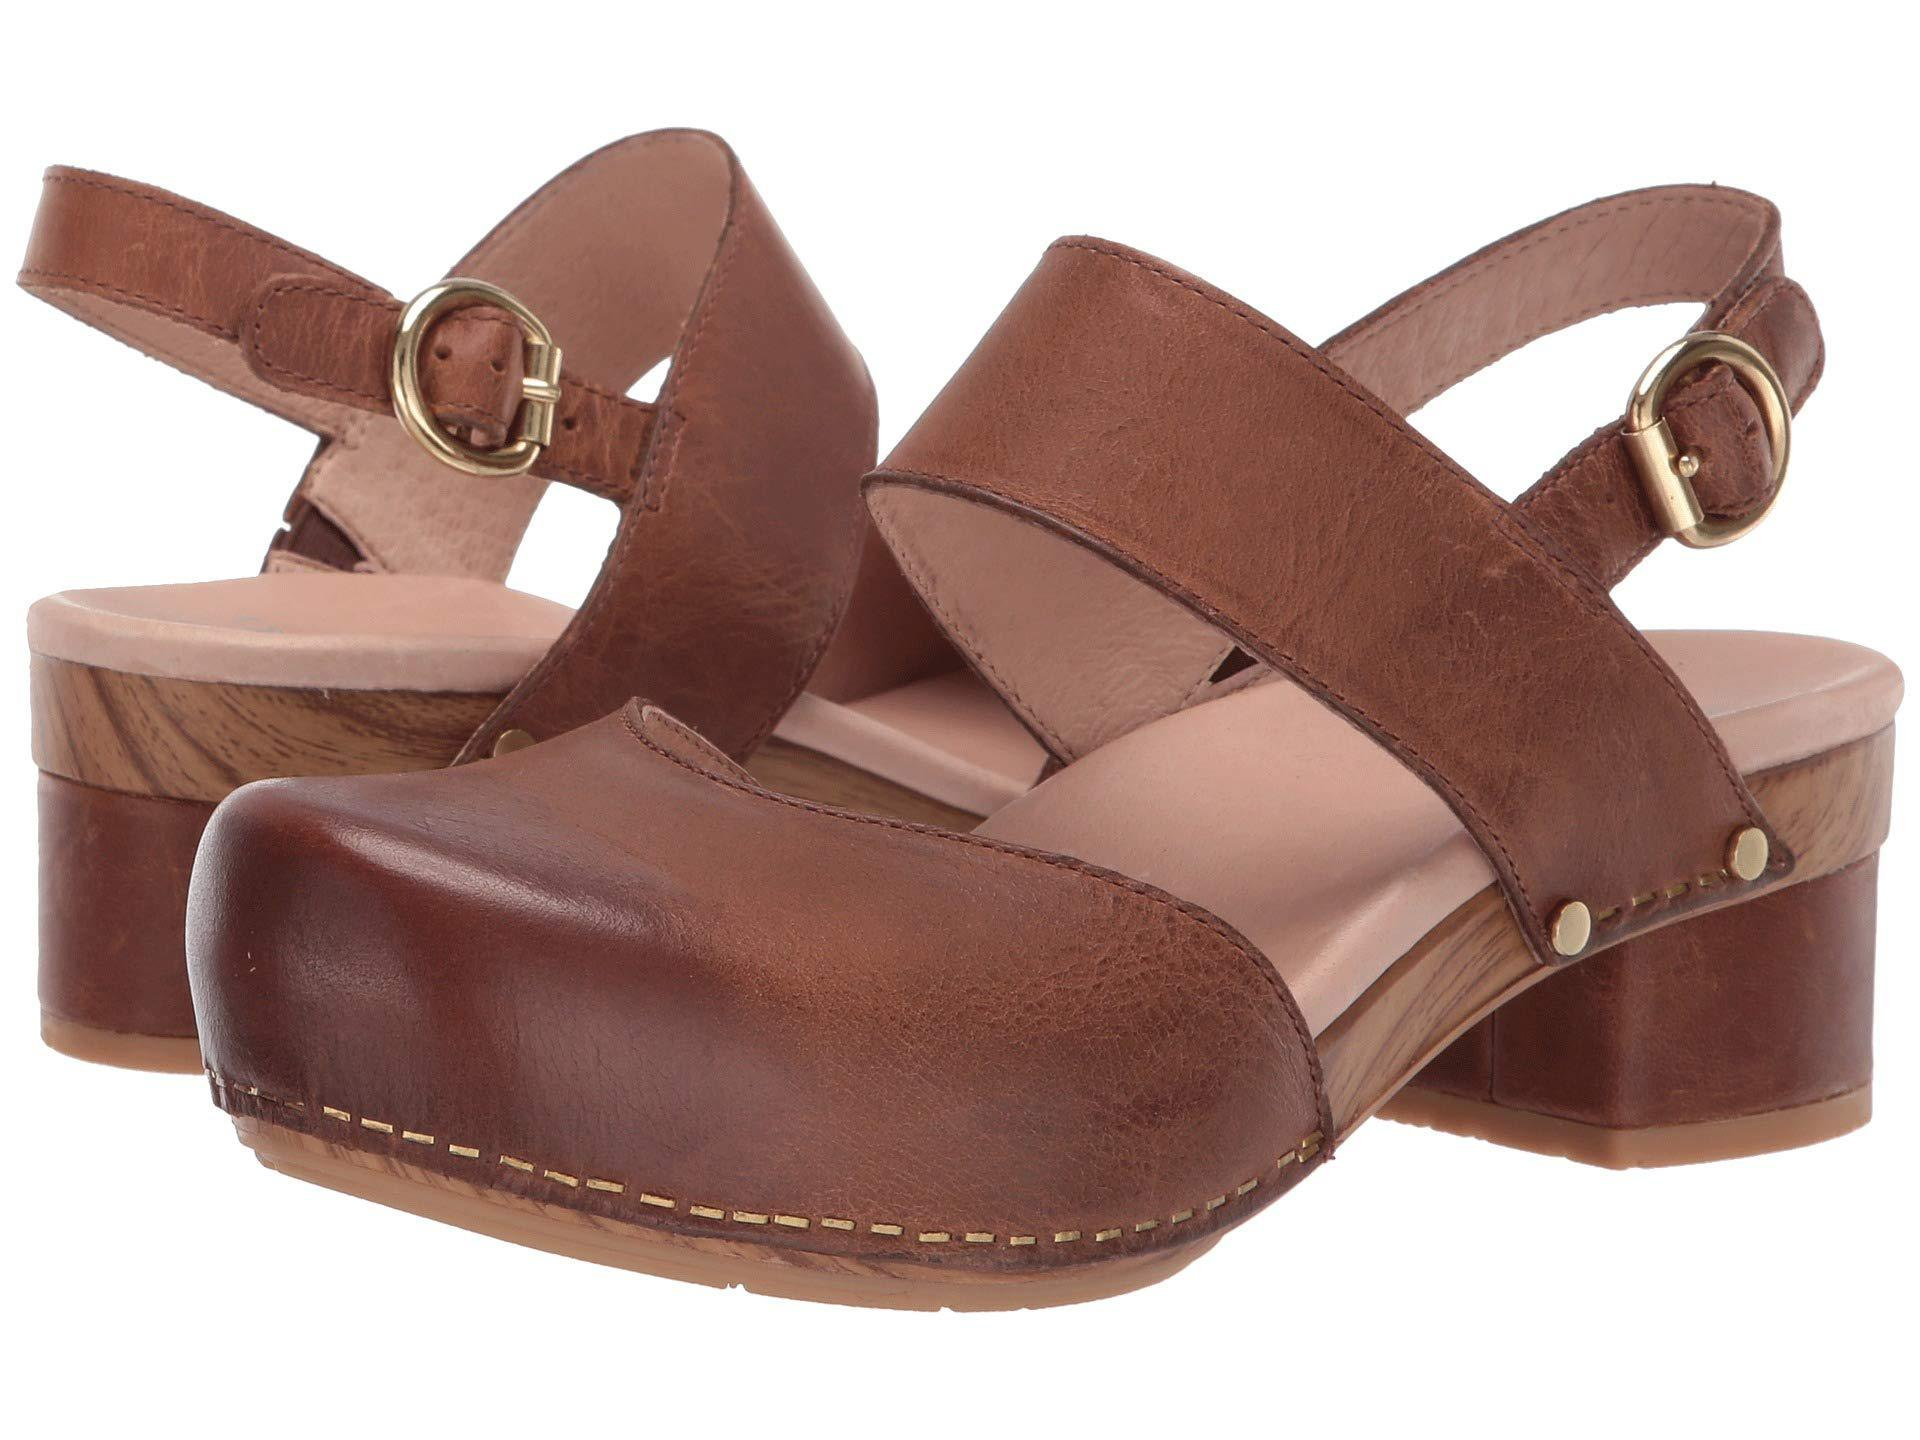 a0b389bf34dc Lyst - Dansko Malin (tan Waxy Burnished) Women s Shoes in Brown